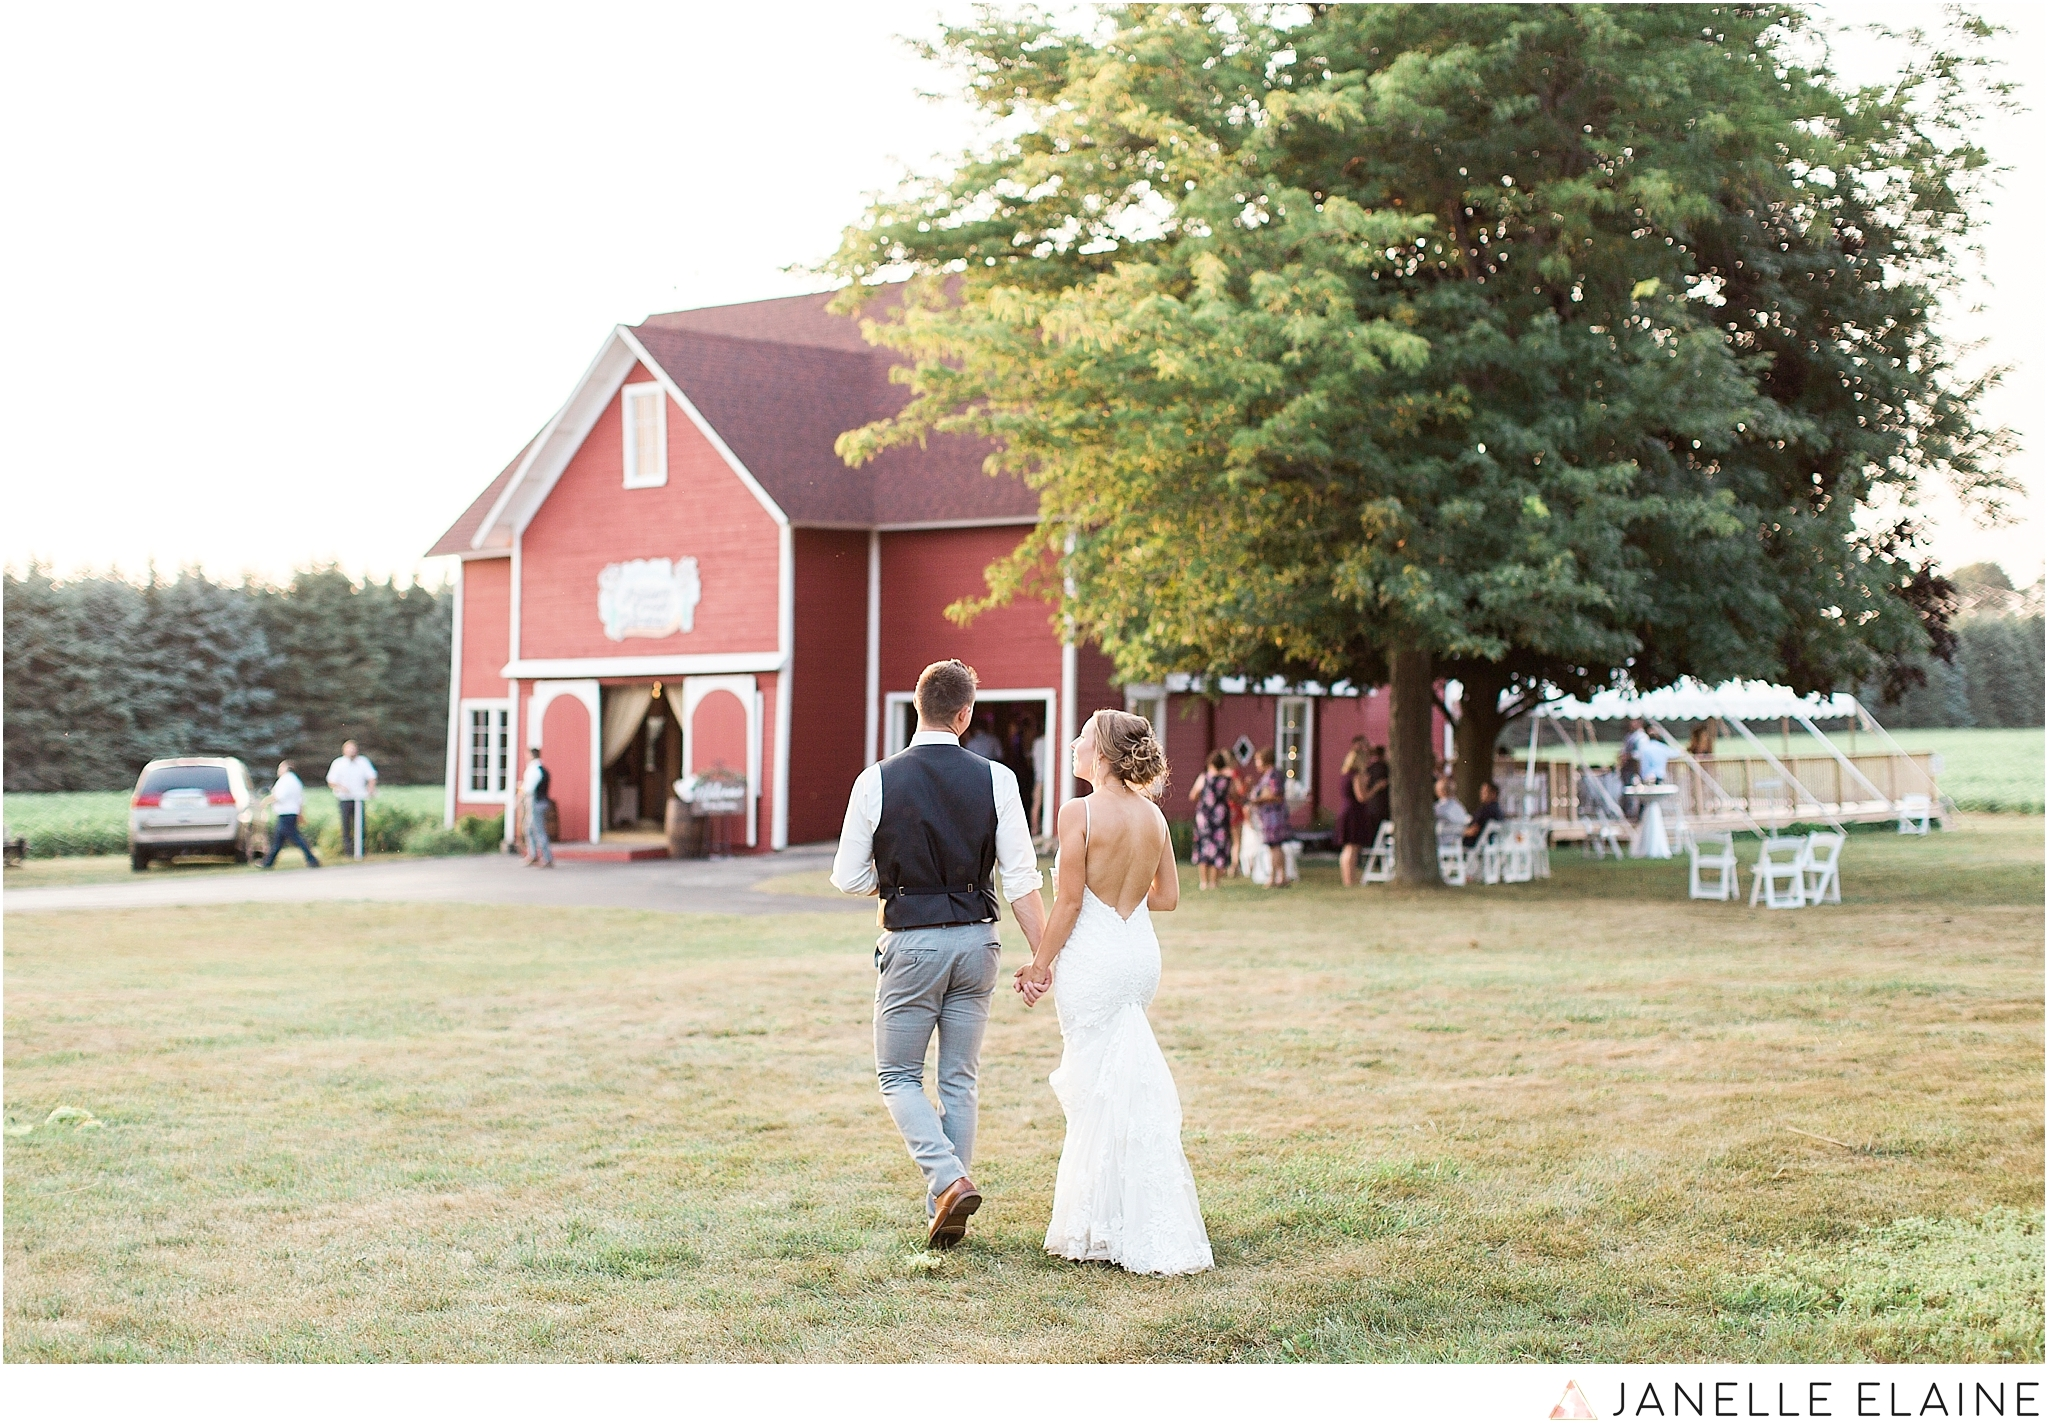 warnsholz-wedding-michigan-photography-janelle elaine photography-214.jpg